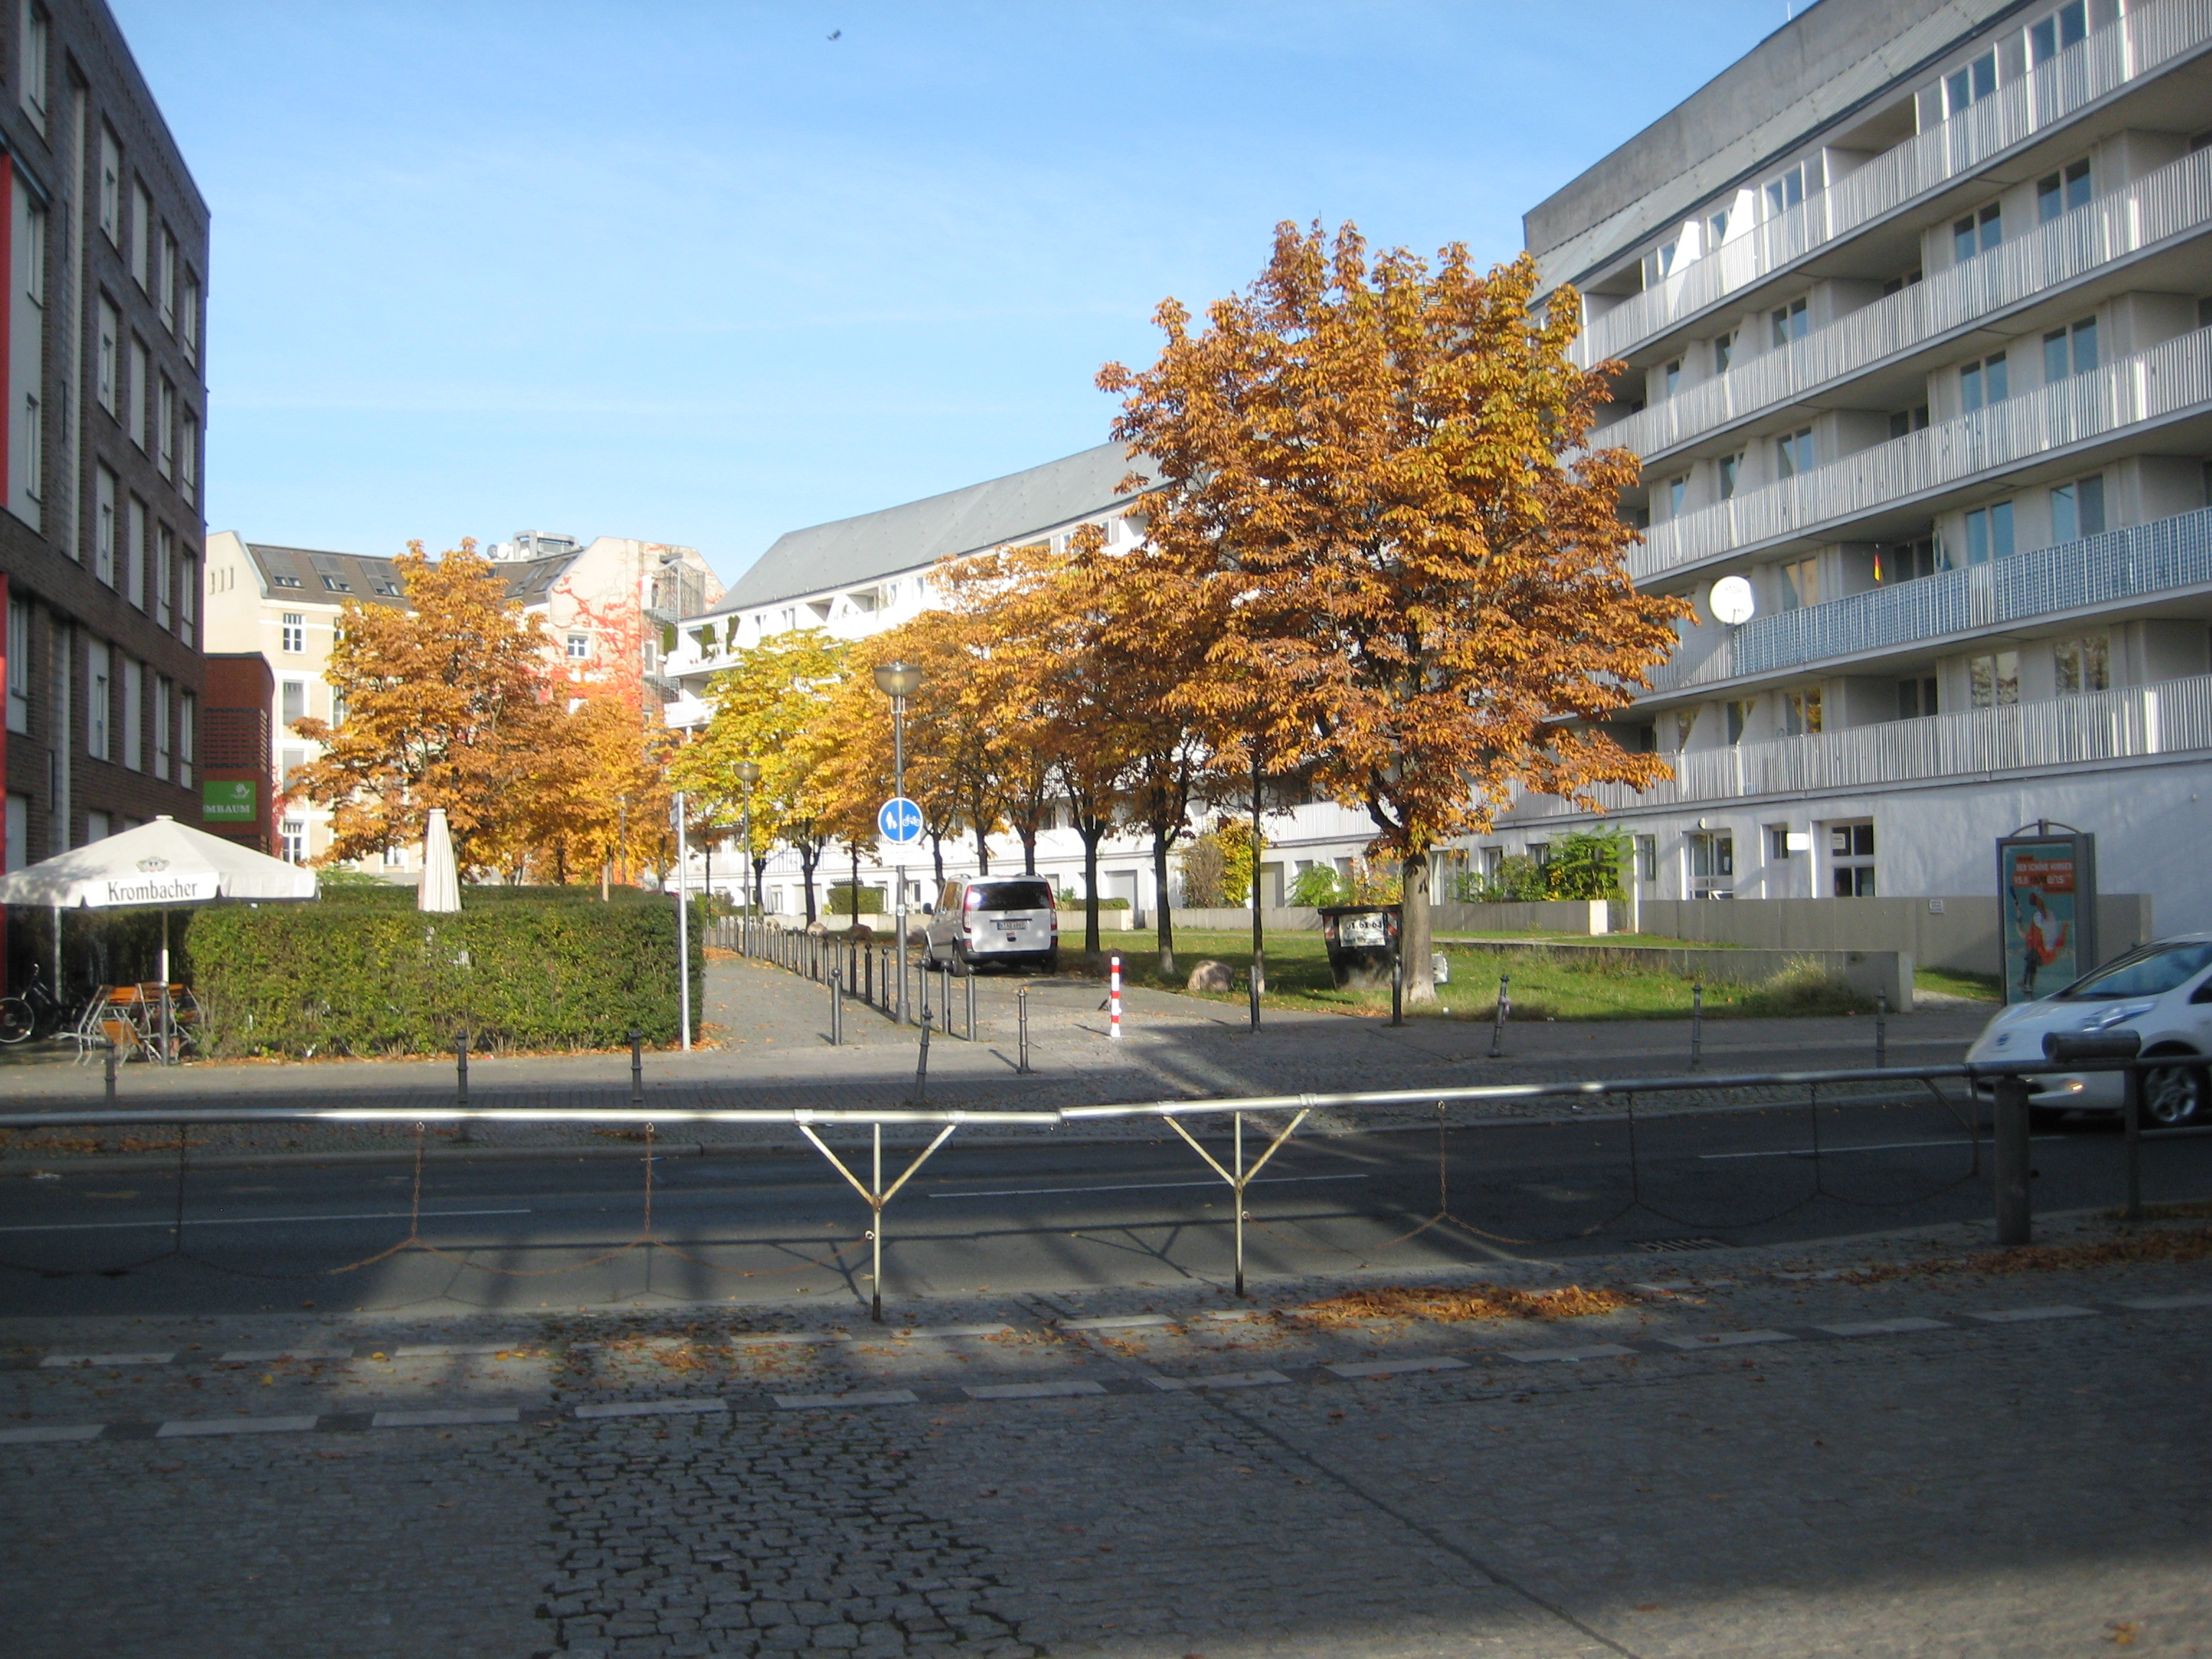 File:Berlin, Schöneberger Str, 2015-2 ...